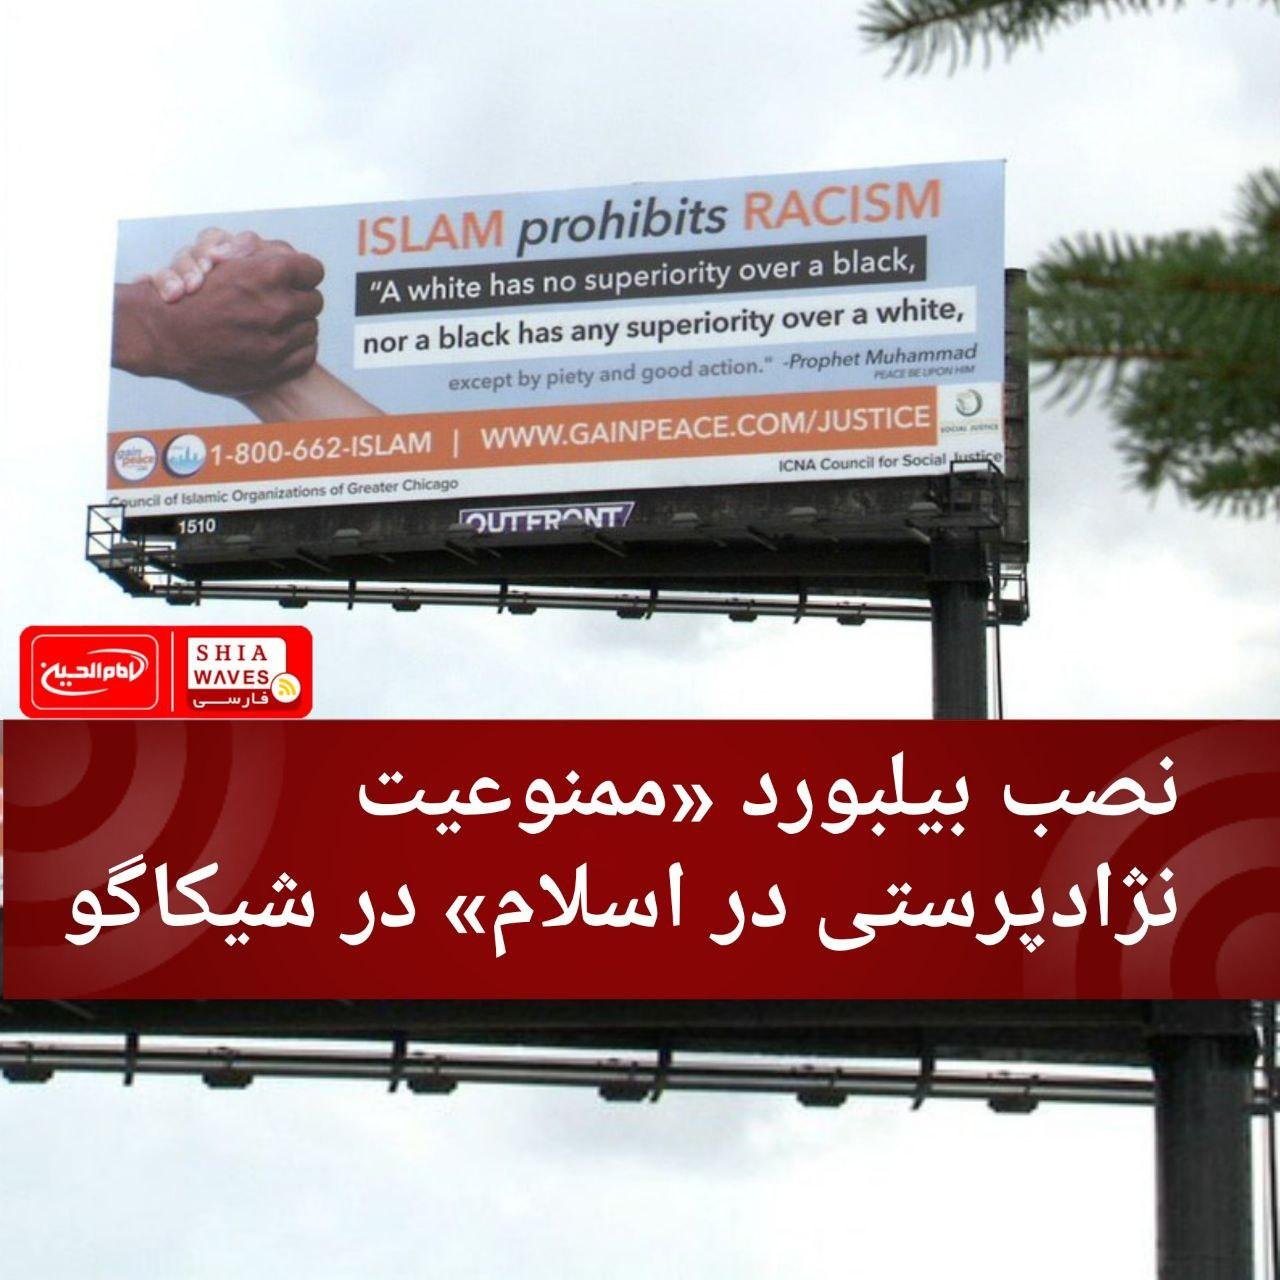 تصویر نصب بیلبورد «ممنوعیت نژادپرستی در اسلام» در شیکاگو